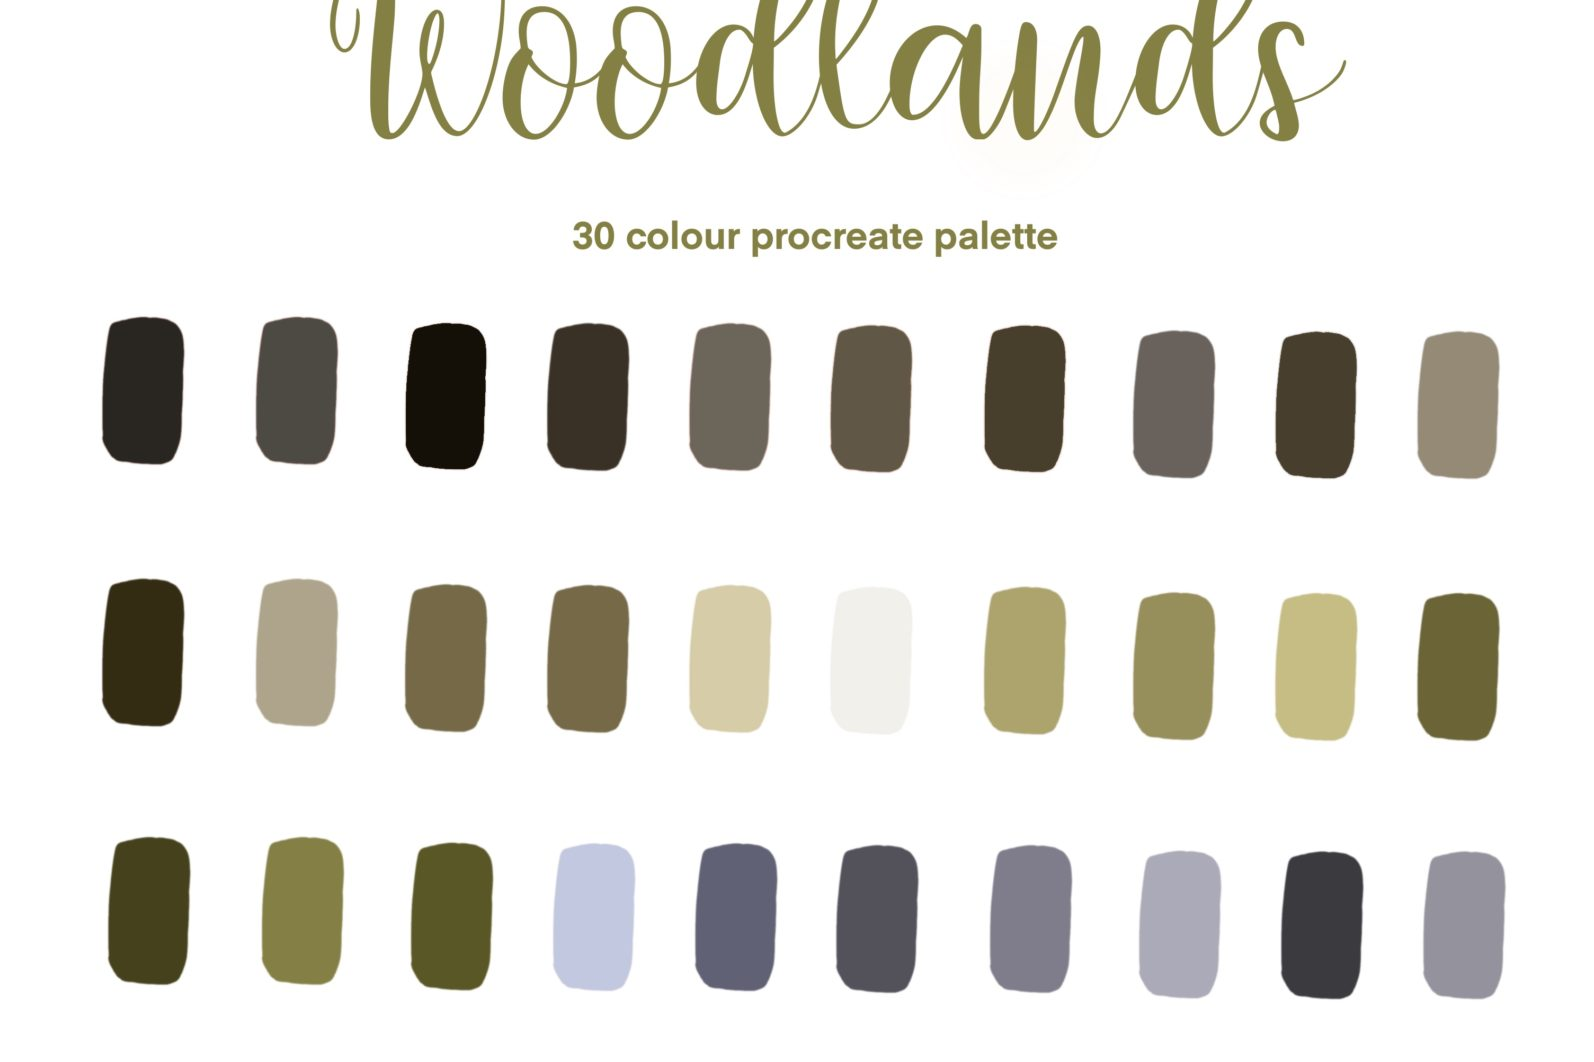 Woodlands Procreate Colour Palette / Procreate Digital Colour Palette - 30 Swatches - 0AC8EA5D F751 4995 A7F9 7372ED15BF7D scaled -